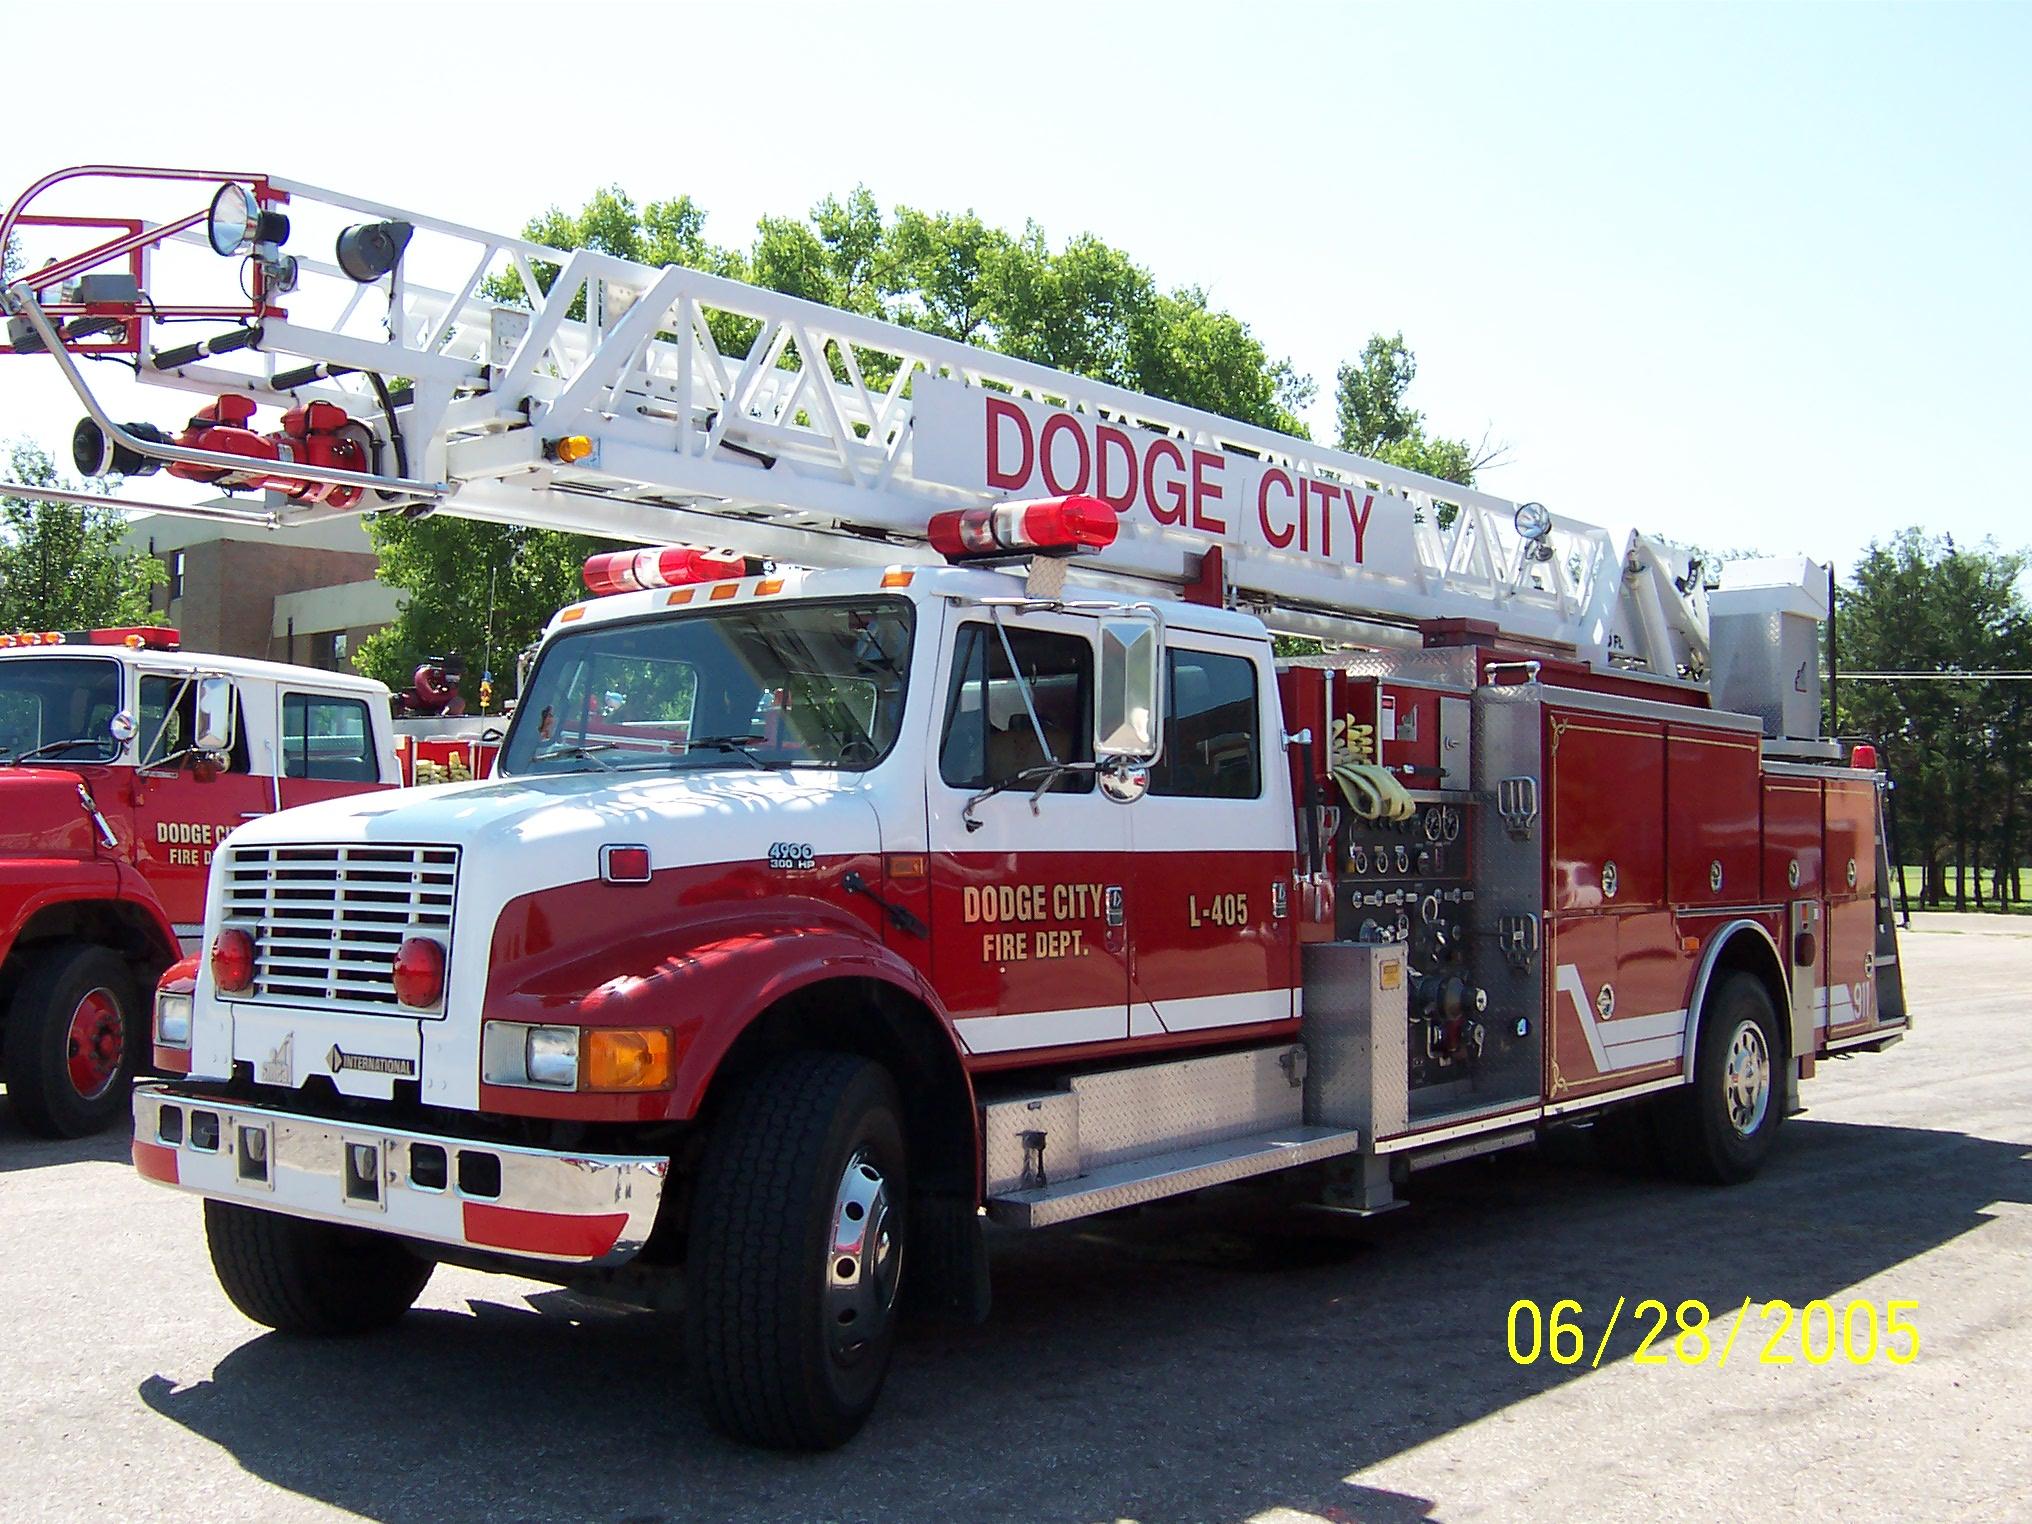 Dodge City, KS - Official Website - Fire Equipment & Other Vehicles